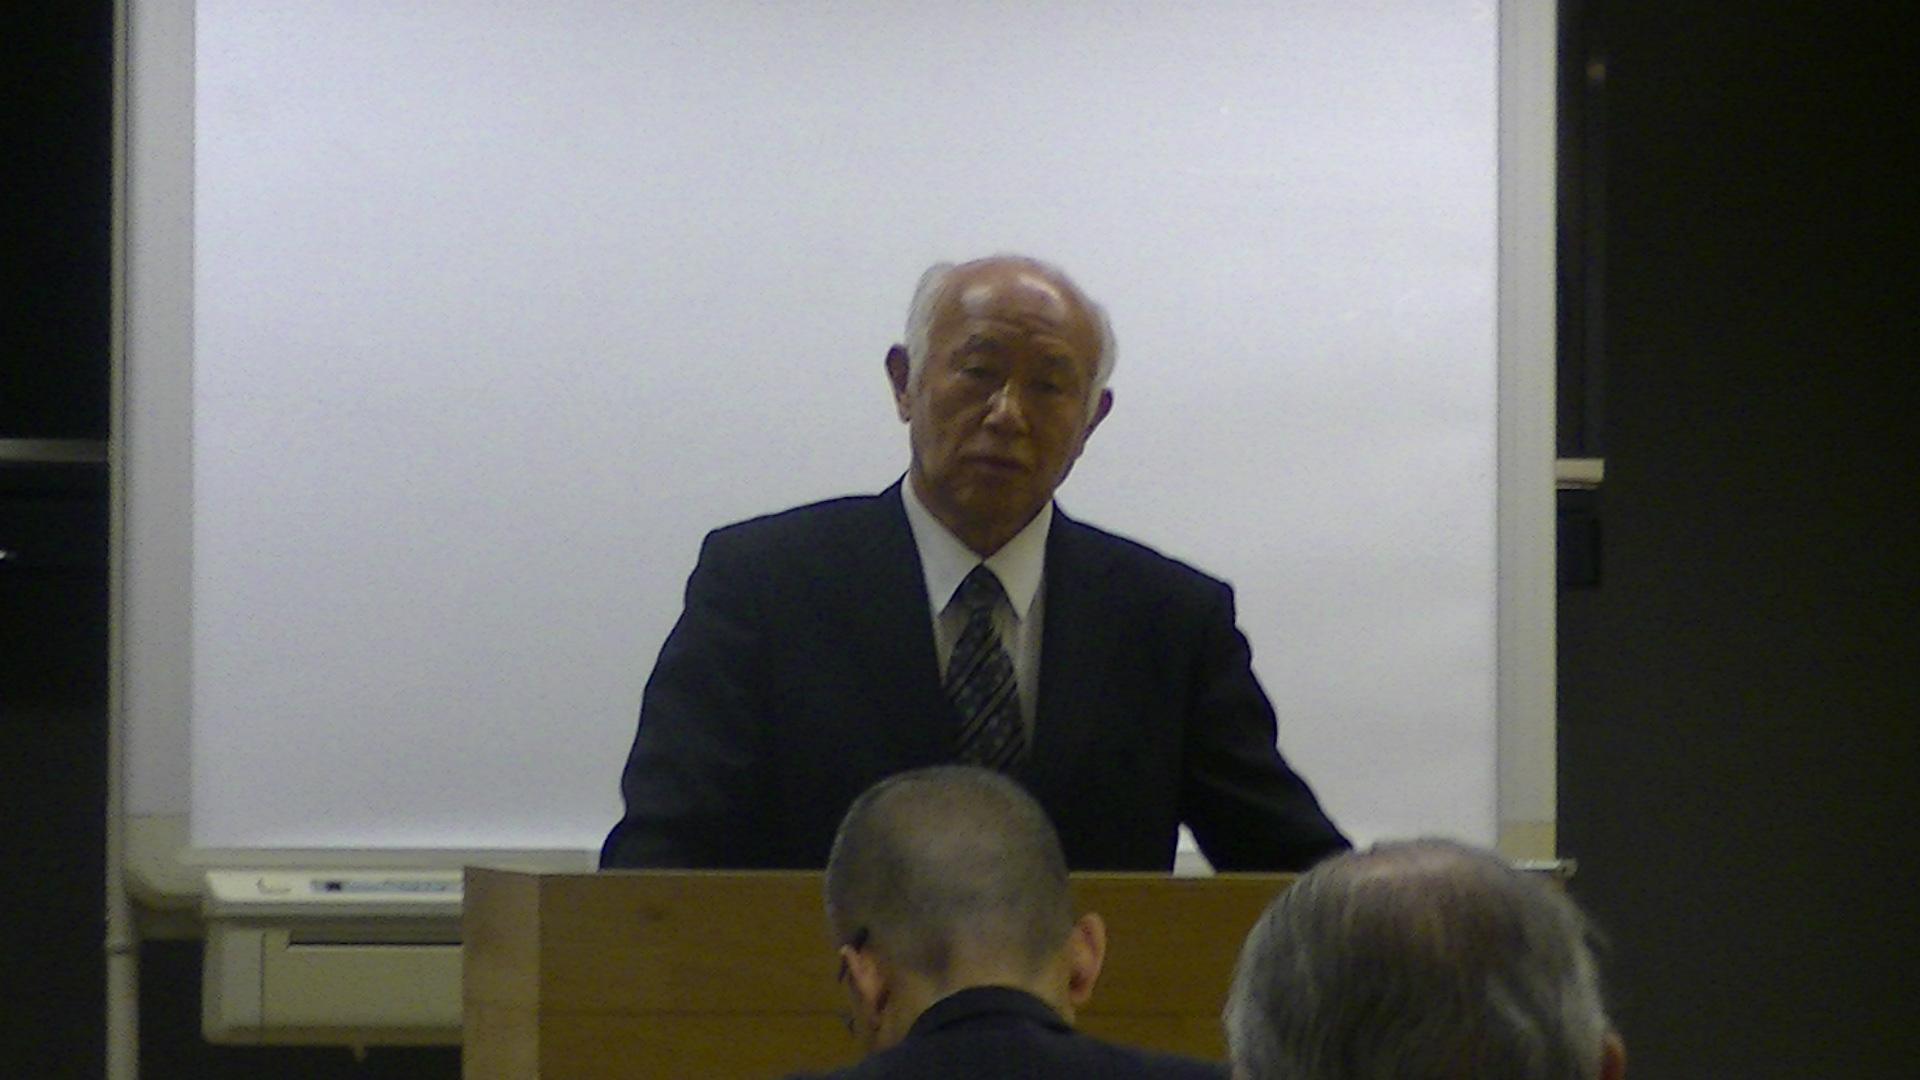 PIC 0097 - 4月1日東京思風塾の開催になります。